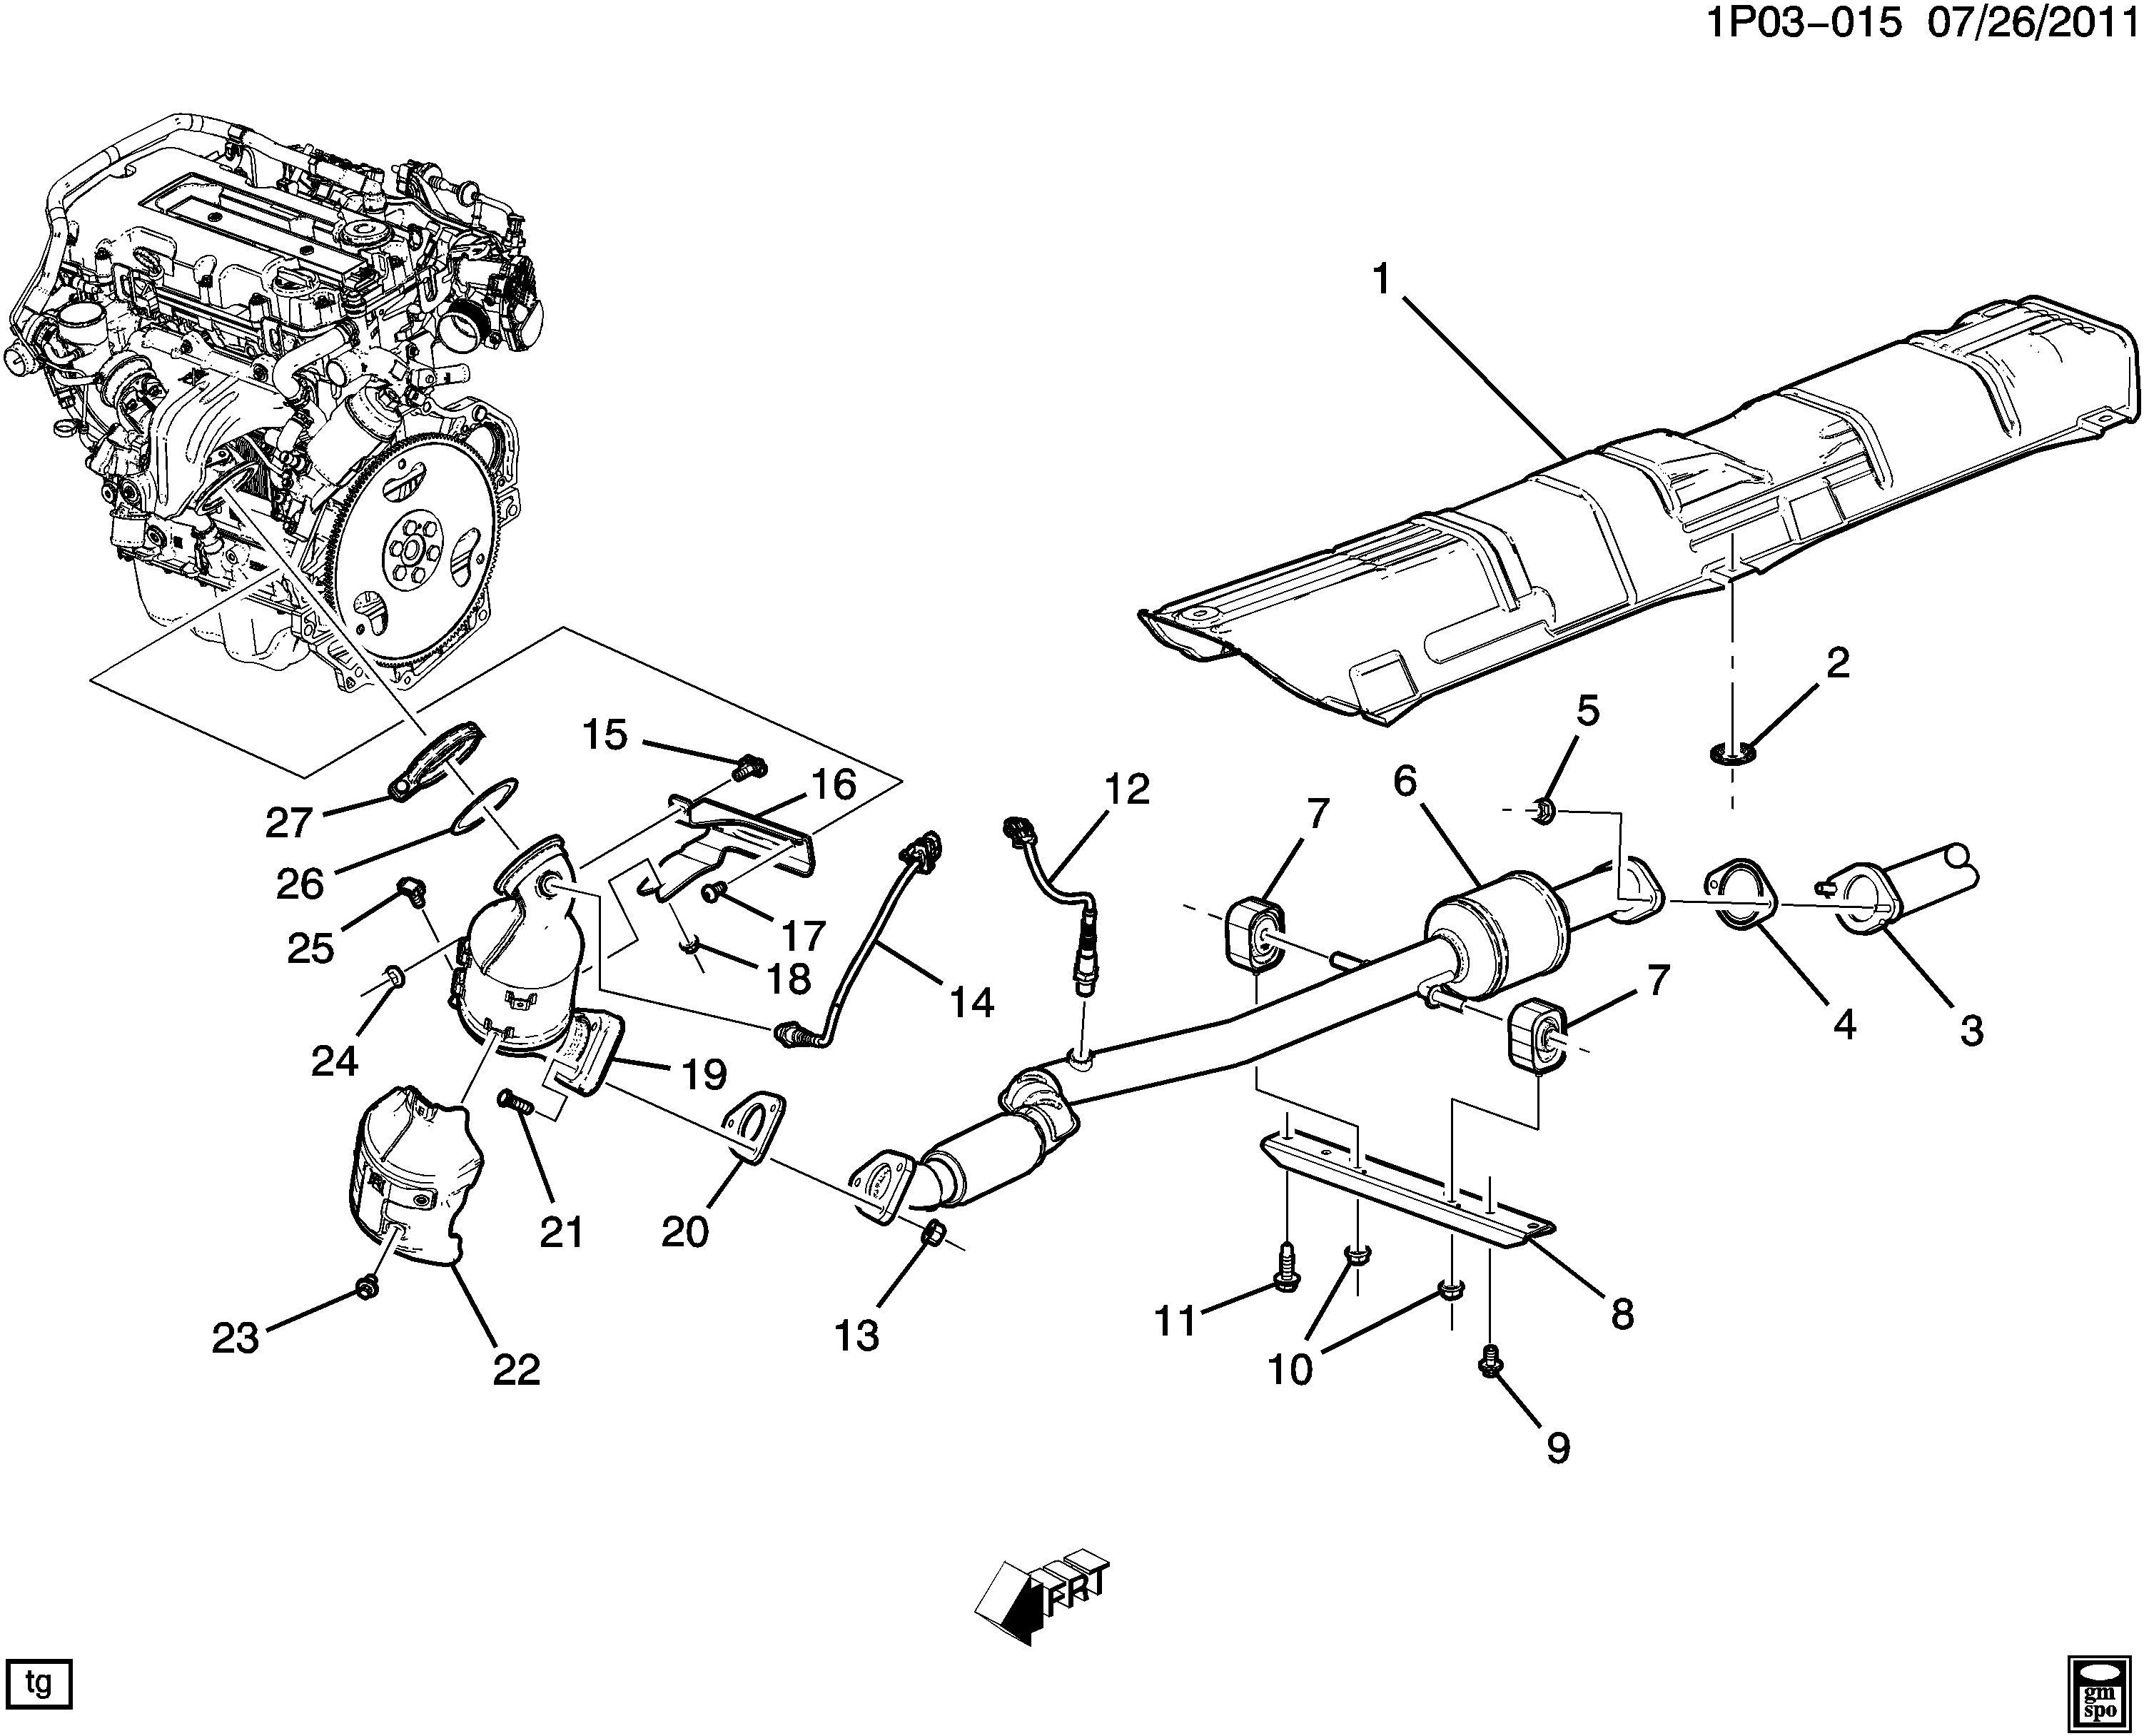 2012 Chevrolet Cruze Bolt. Intake & exhaust manifold. Bolt